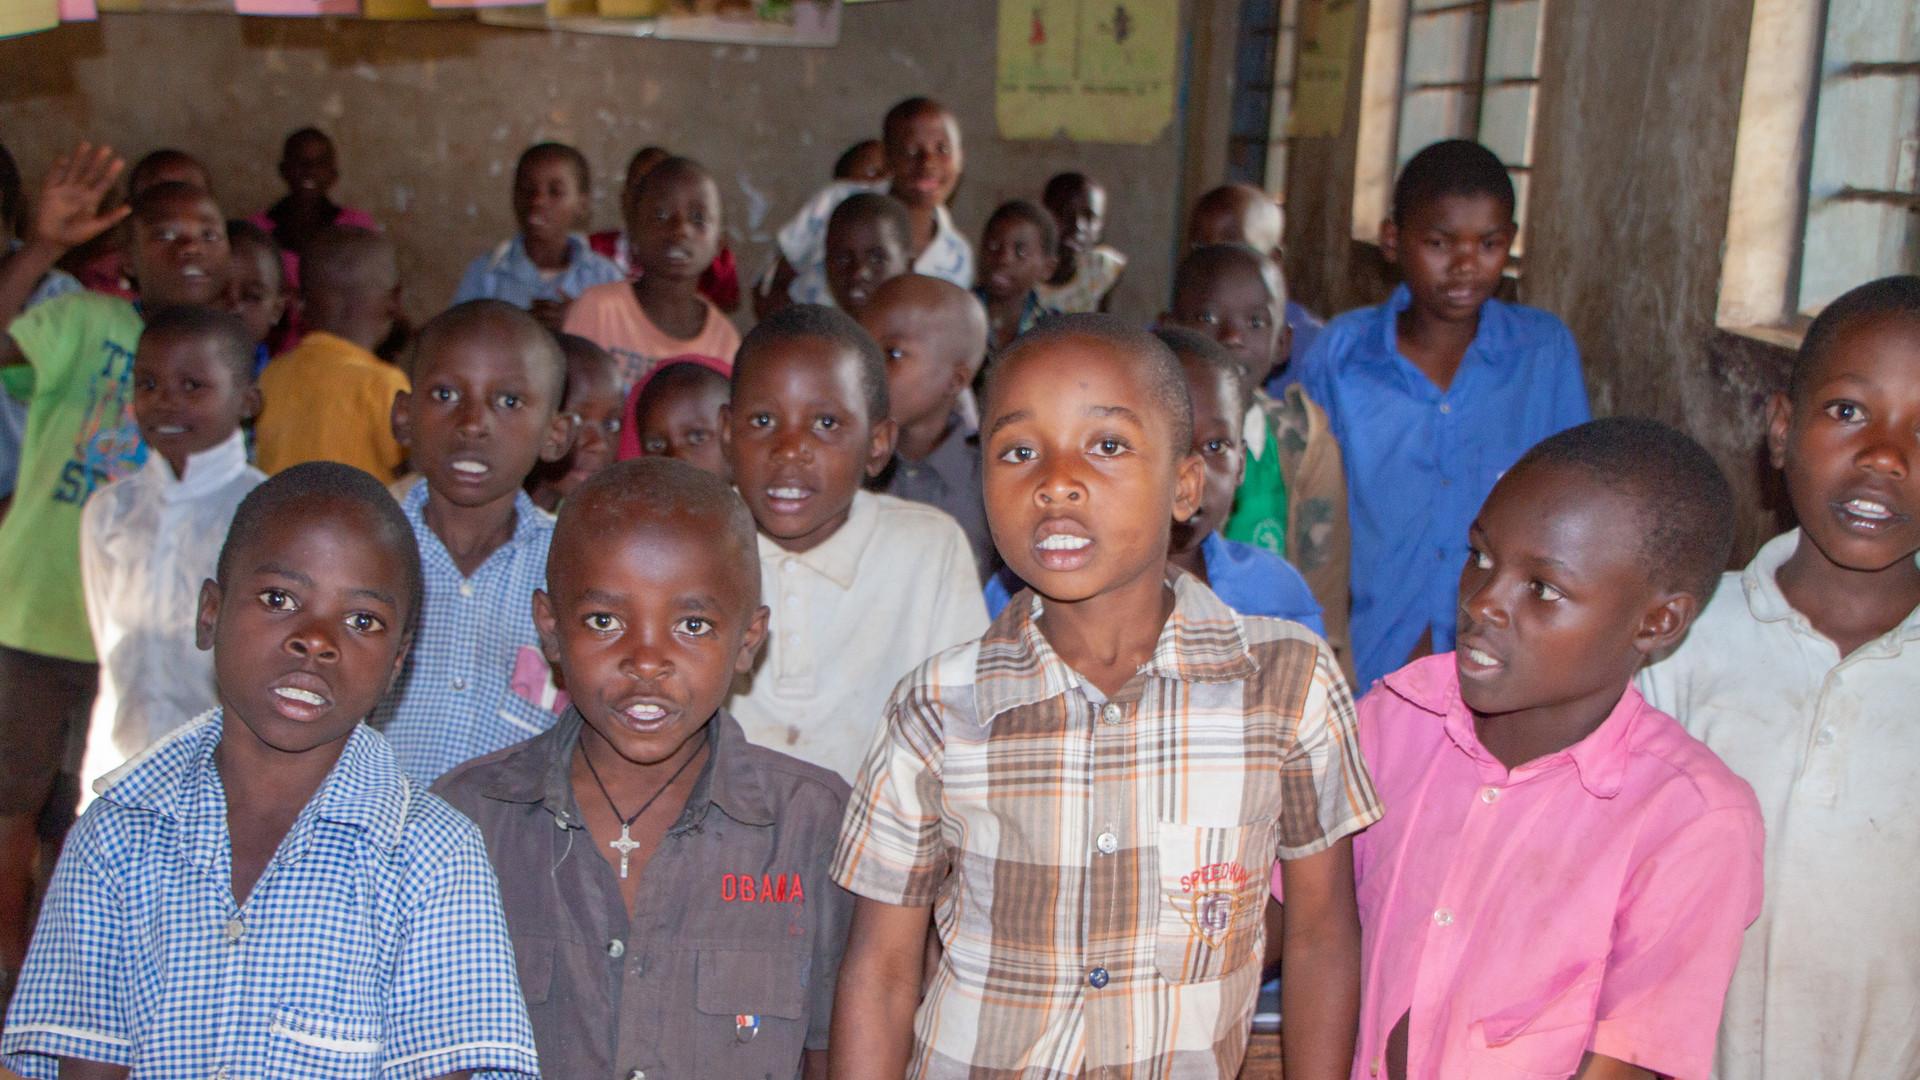 School children in Uganda